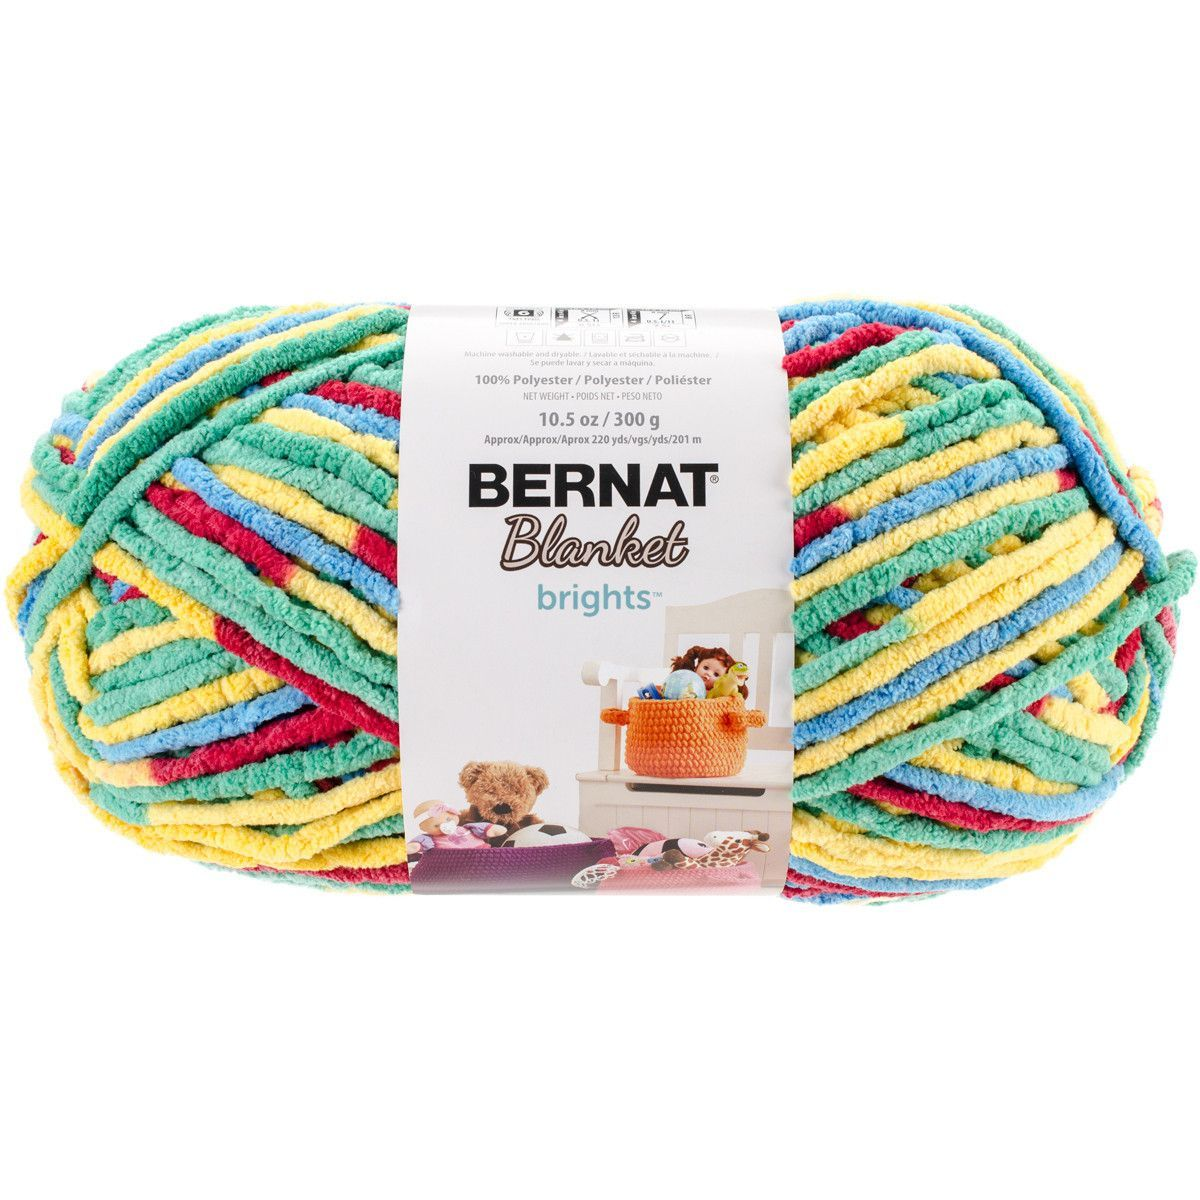 Bernat® Blanket Brights Big Ball Yarn Rainbow Shine